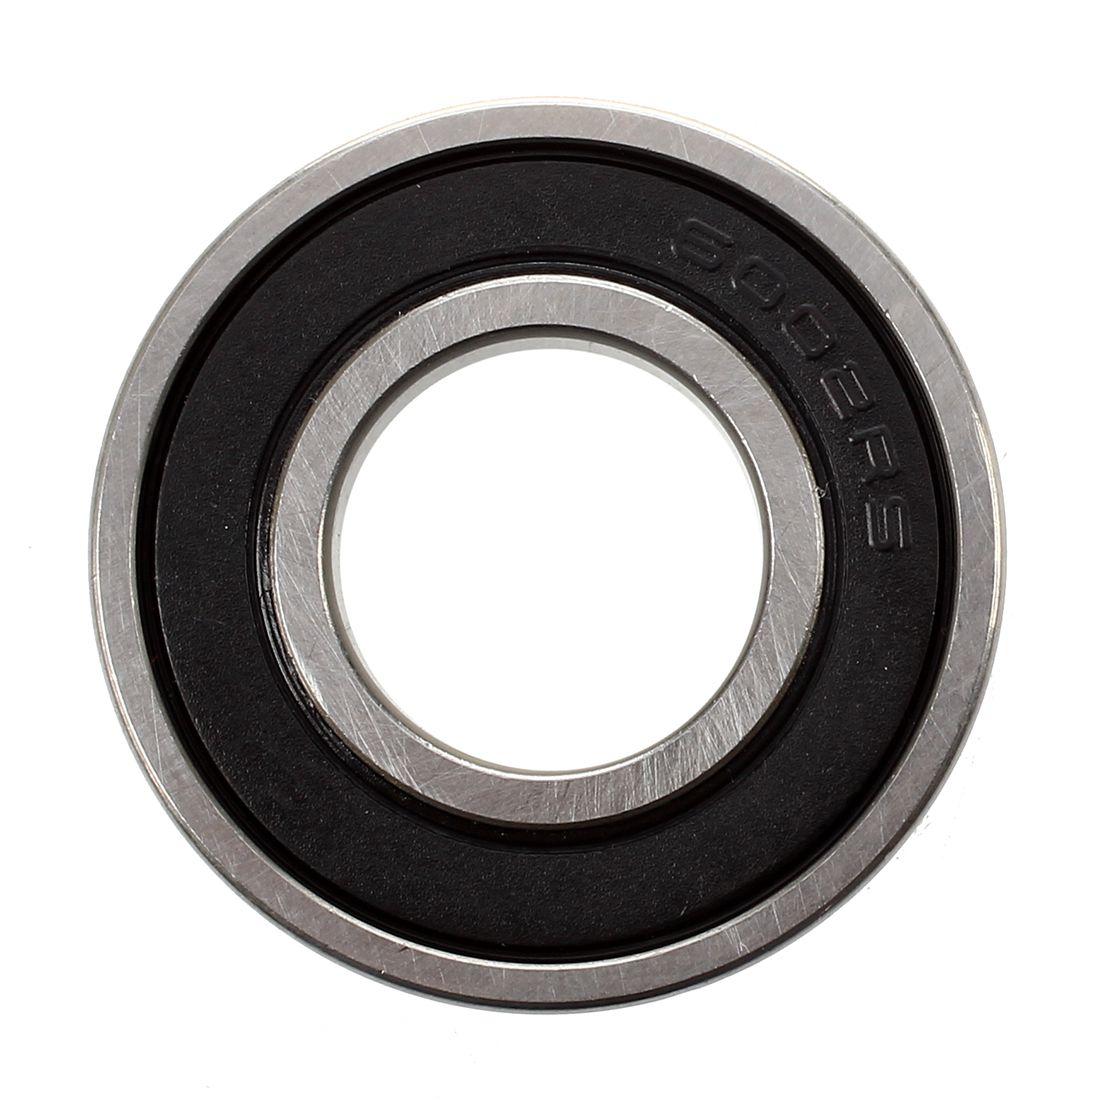 Venta al por mayor de 15mm x 32mm x 9mm de ancho de una sola fila de ranura profunda sellado Rodamiento de bolas Radial 6002RS